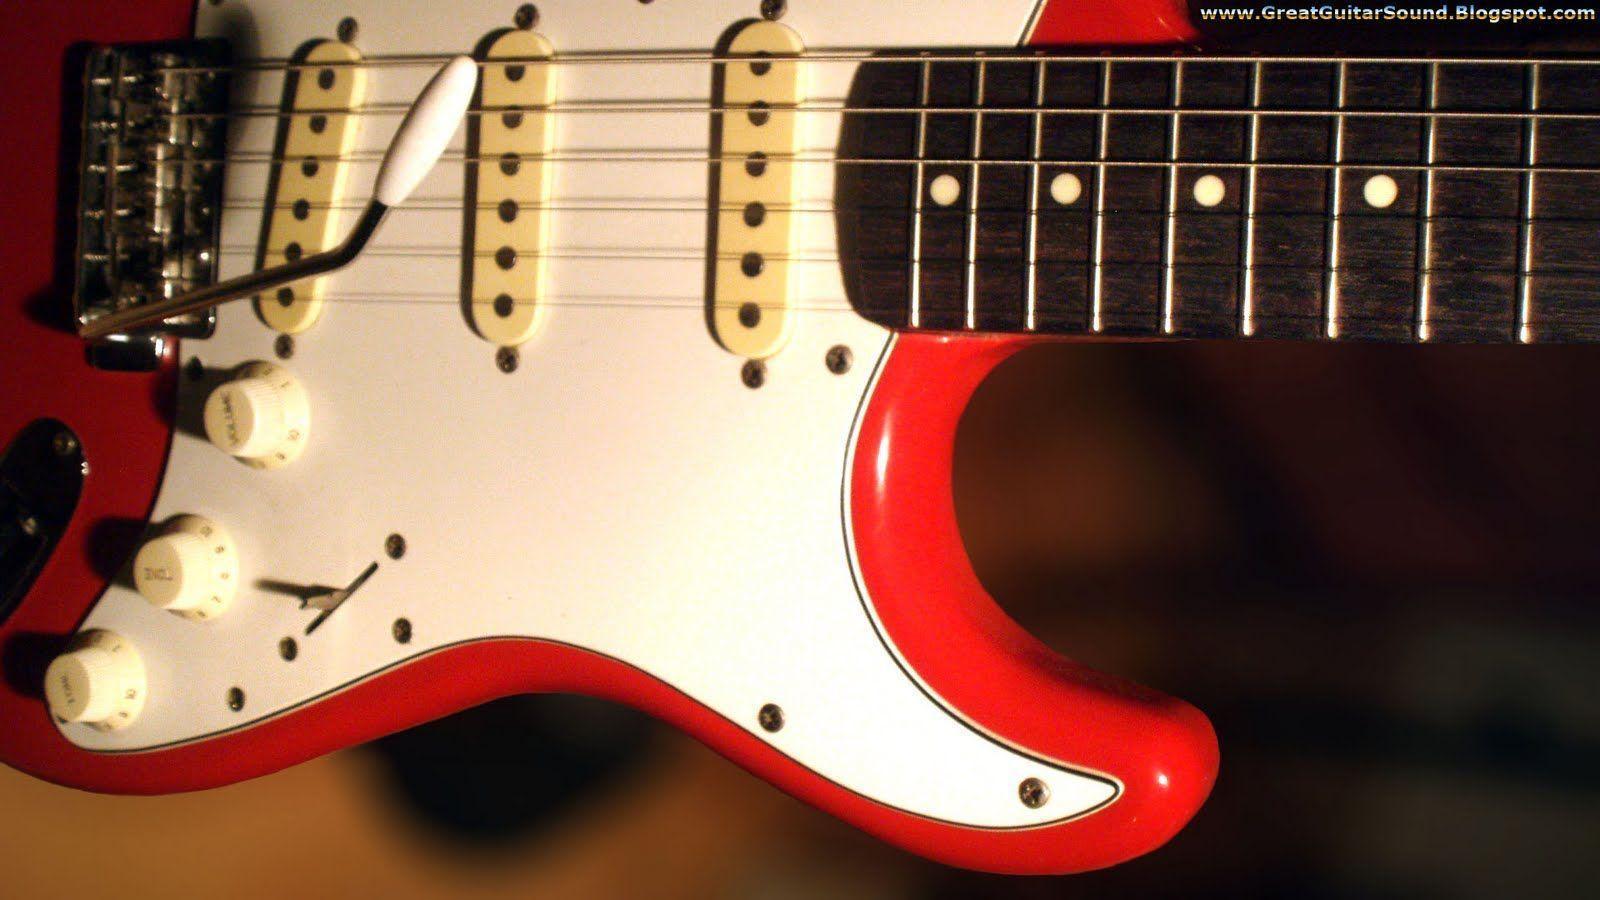 fender guitar wallpapers - wallpaper cave